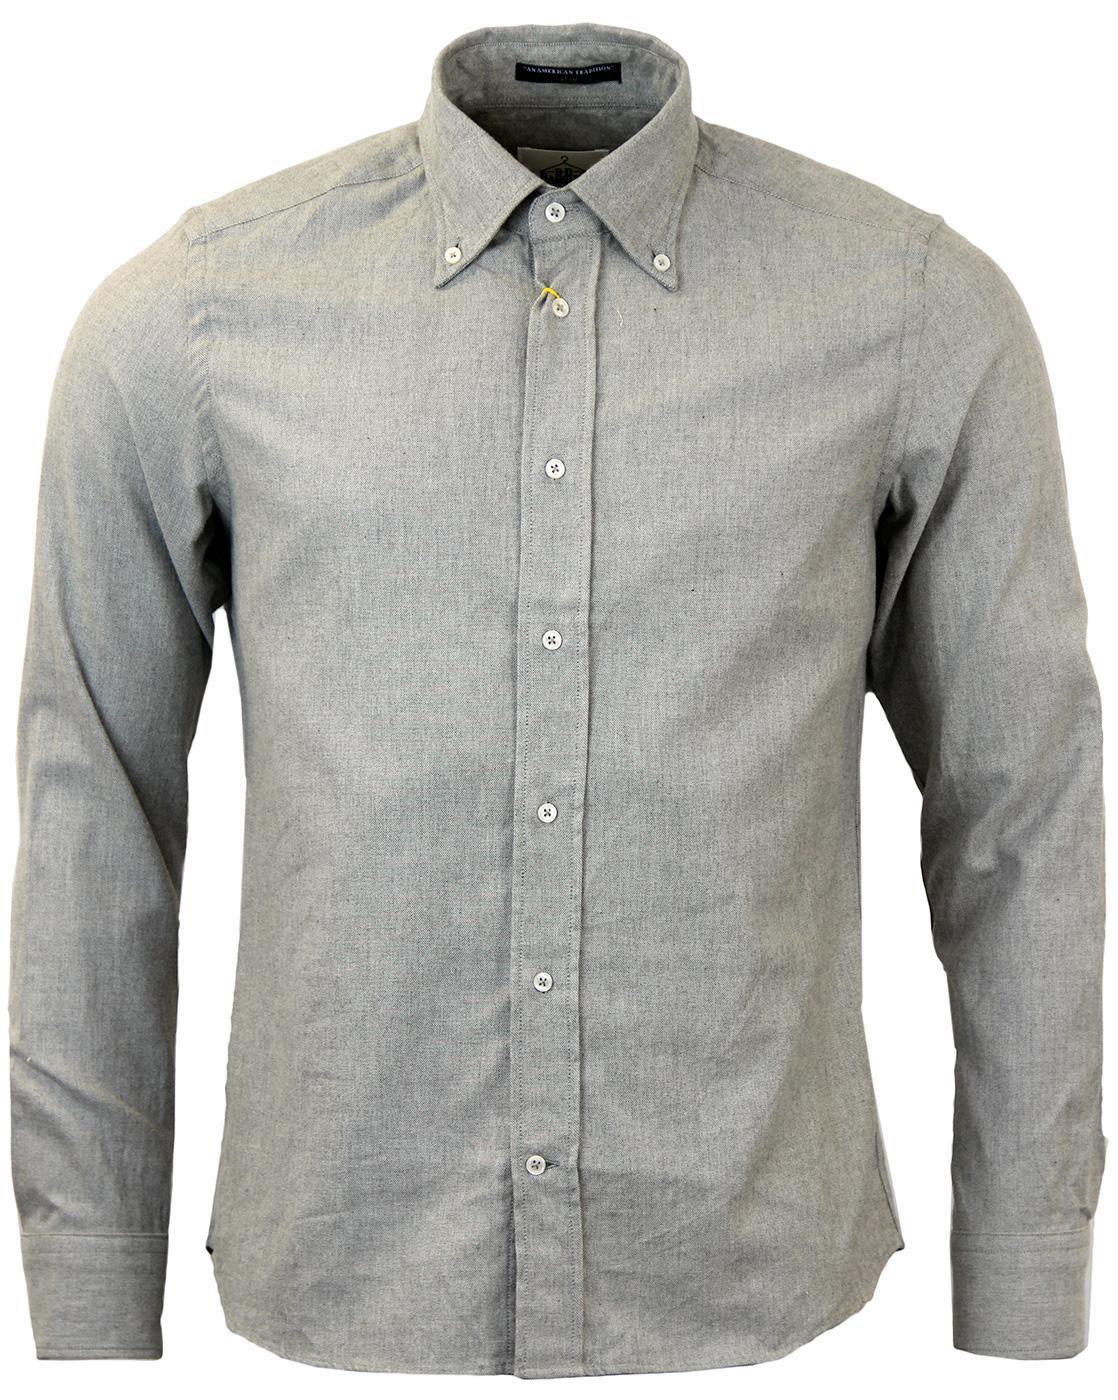 Dexter B D BAGGIES Retro Mod Oxford Shirt